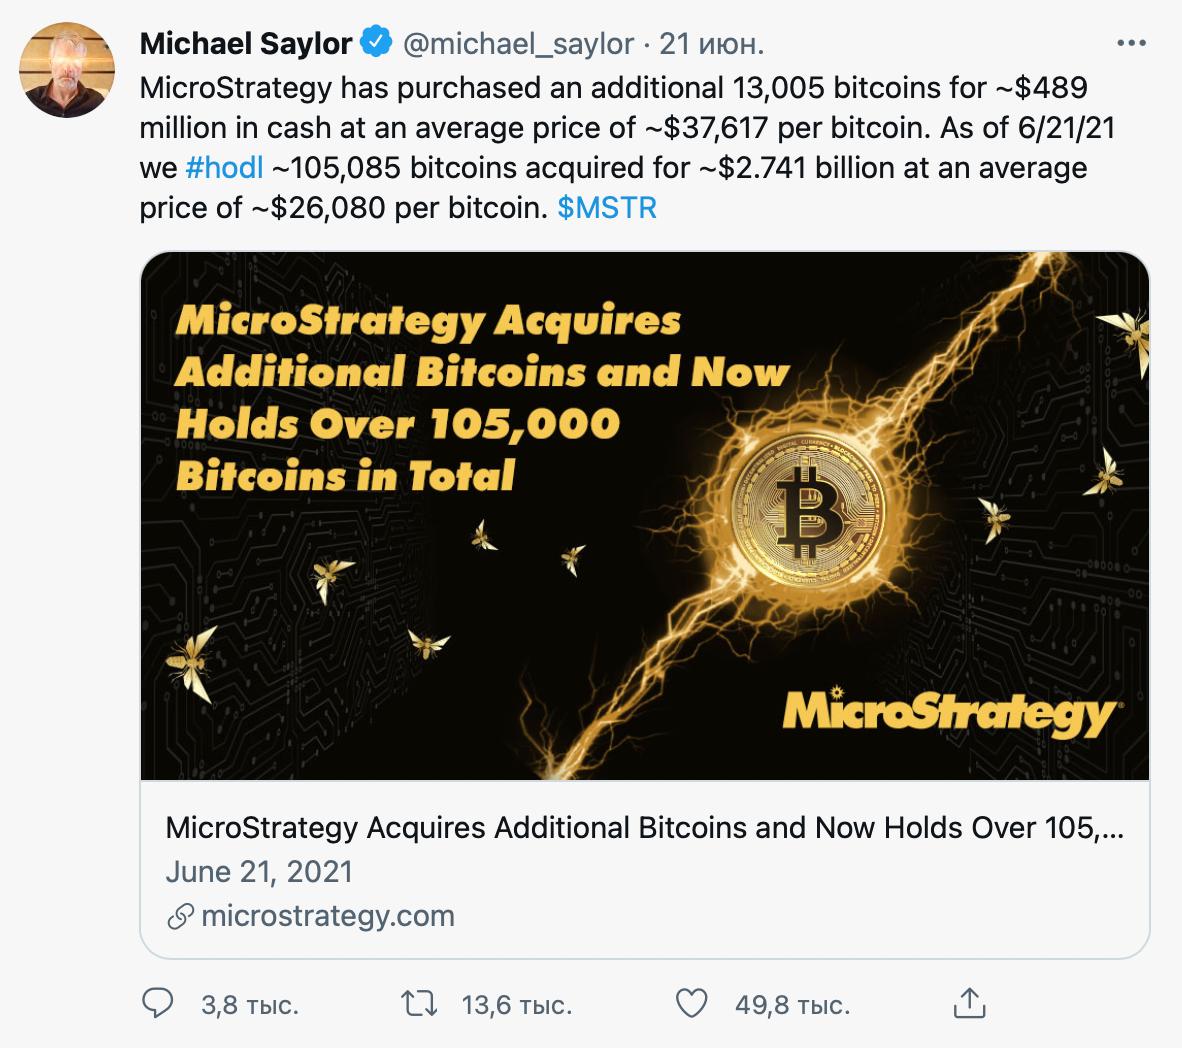 21 июня 2021года глава MicroStrategy сообщил в«Твиттере» опокупке биткоинов на489млн$